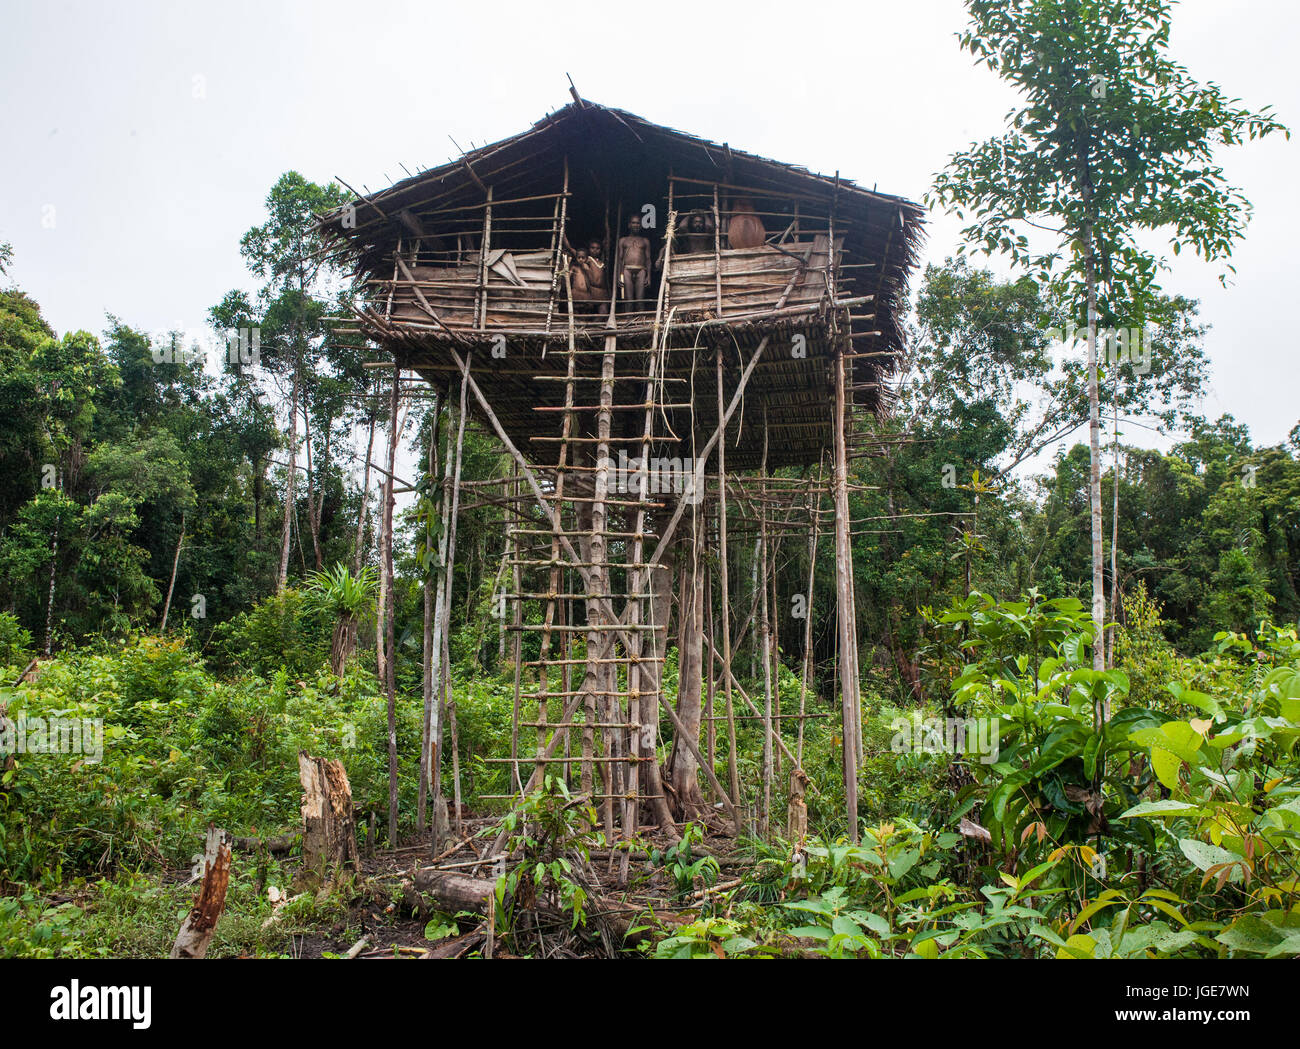 Korowai Tribe High Resolution Stock Photography And Images Alamy